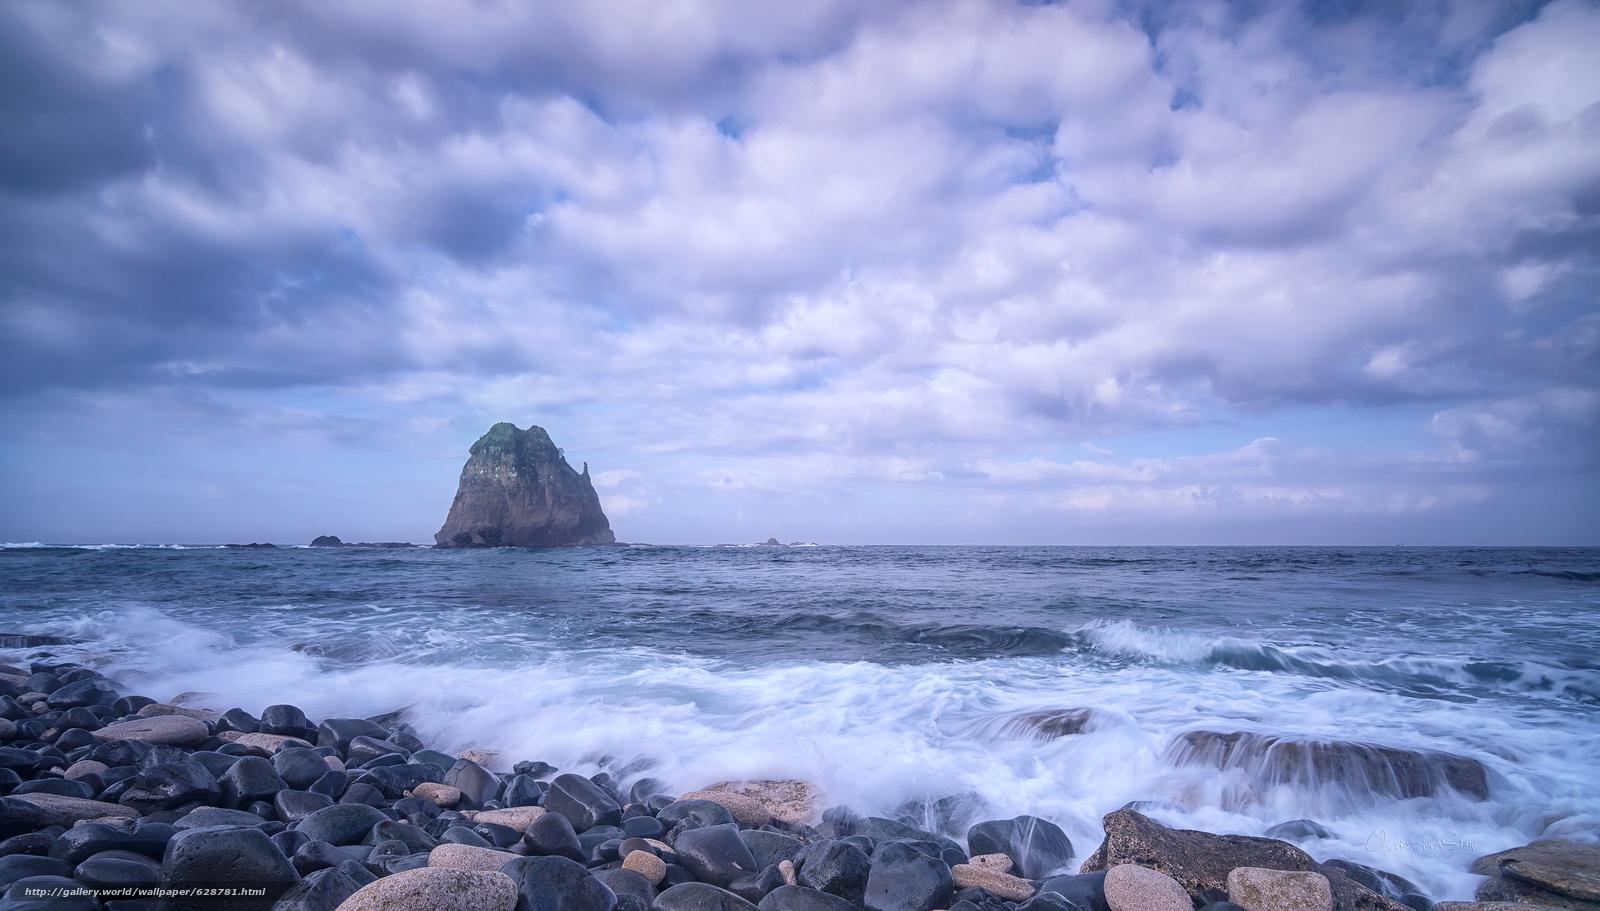 закат, море, берег, камни, скала, пейзаж